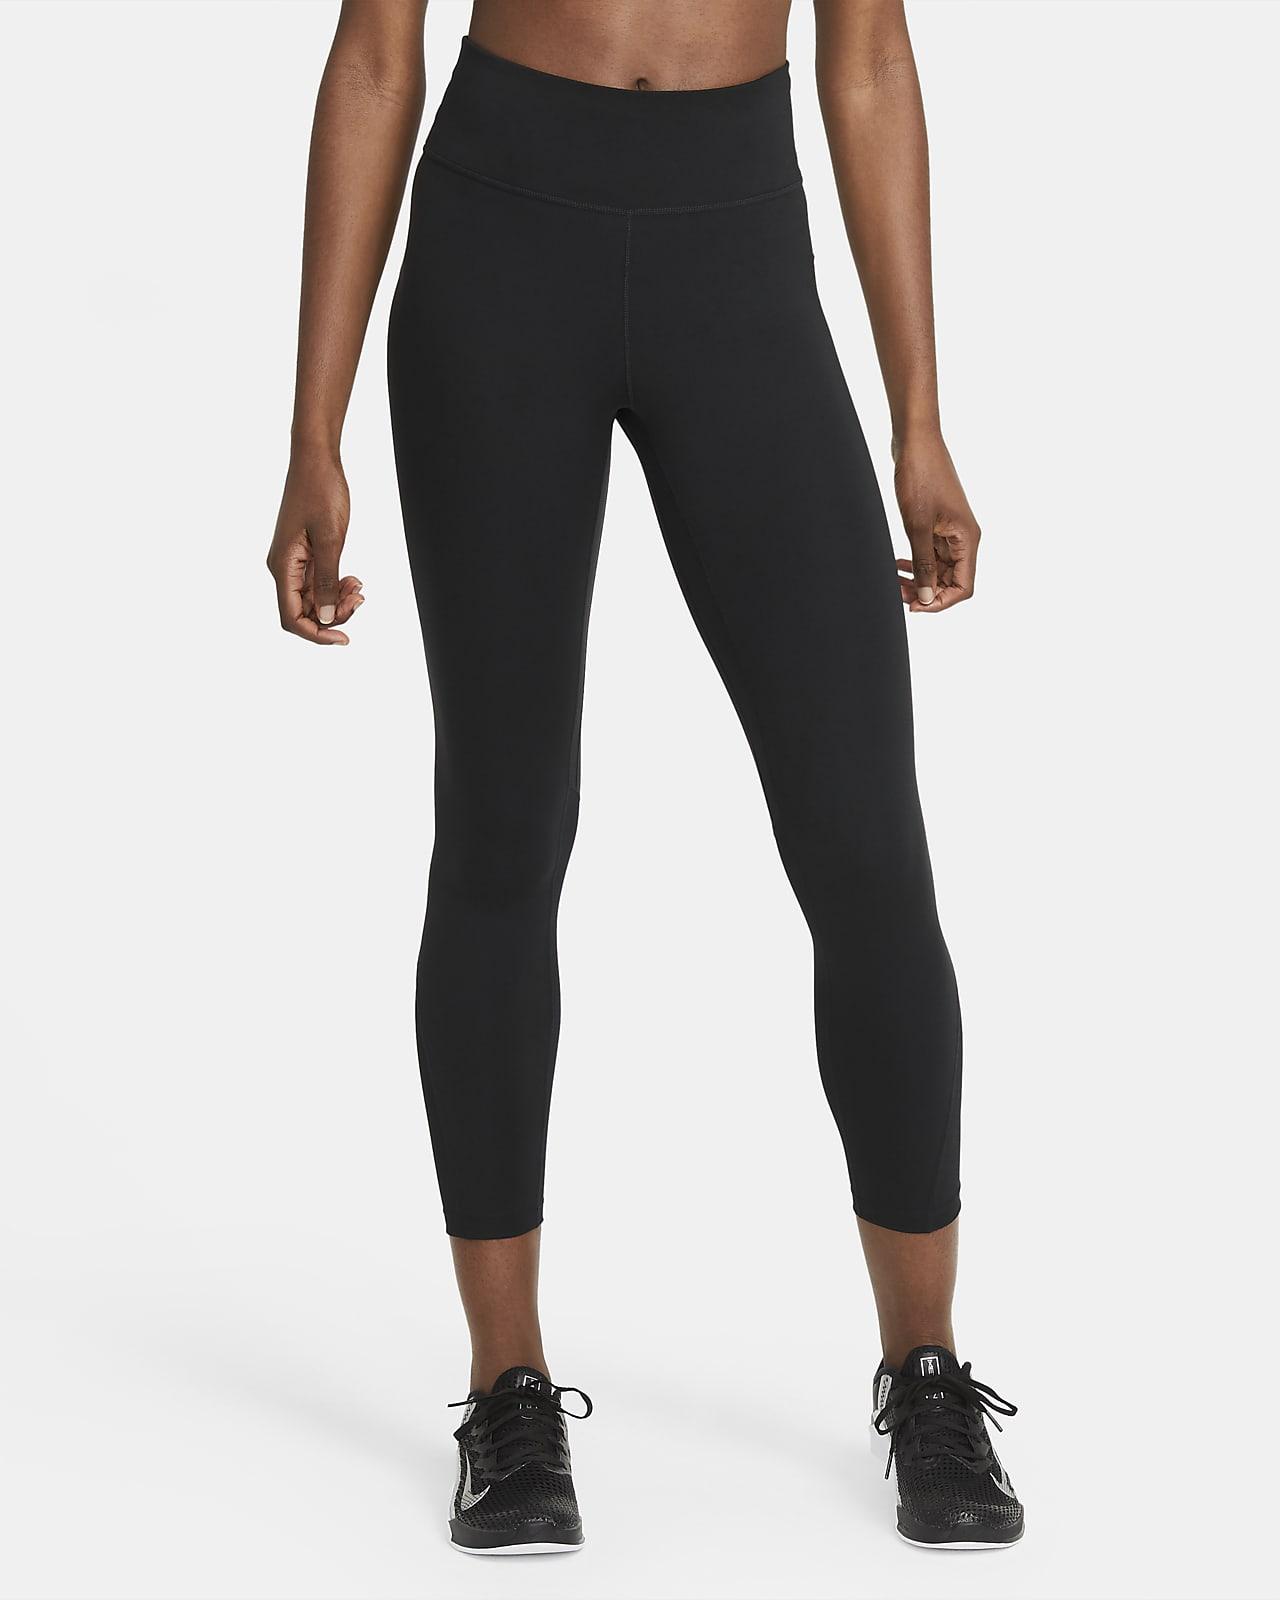 Leggings de 7/8 de tiro medio para mujer Nike One